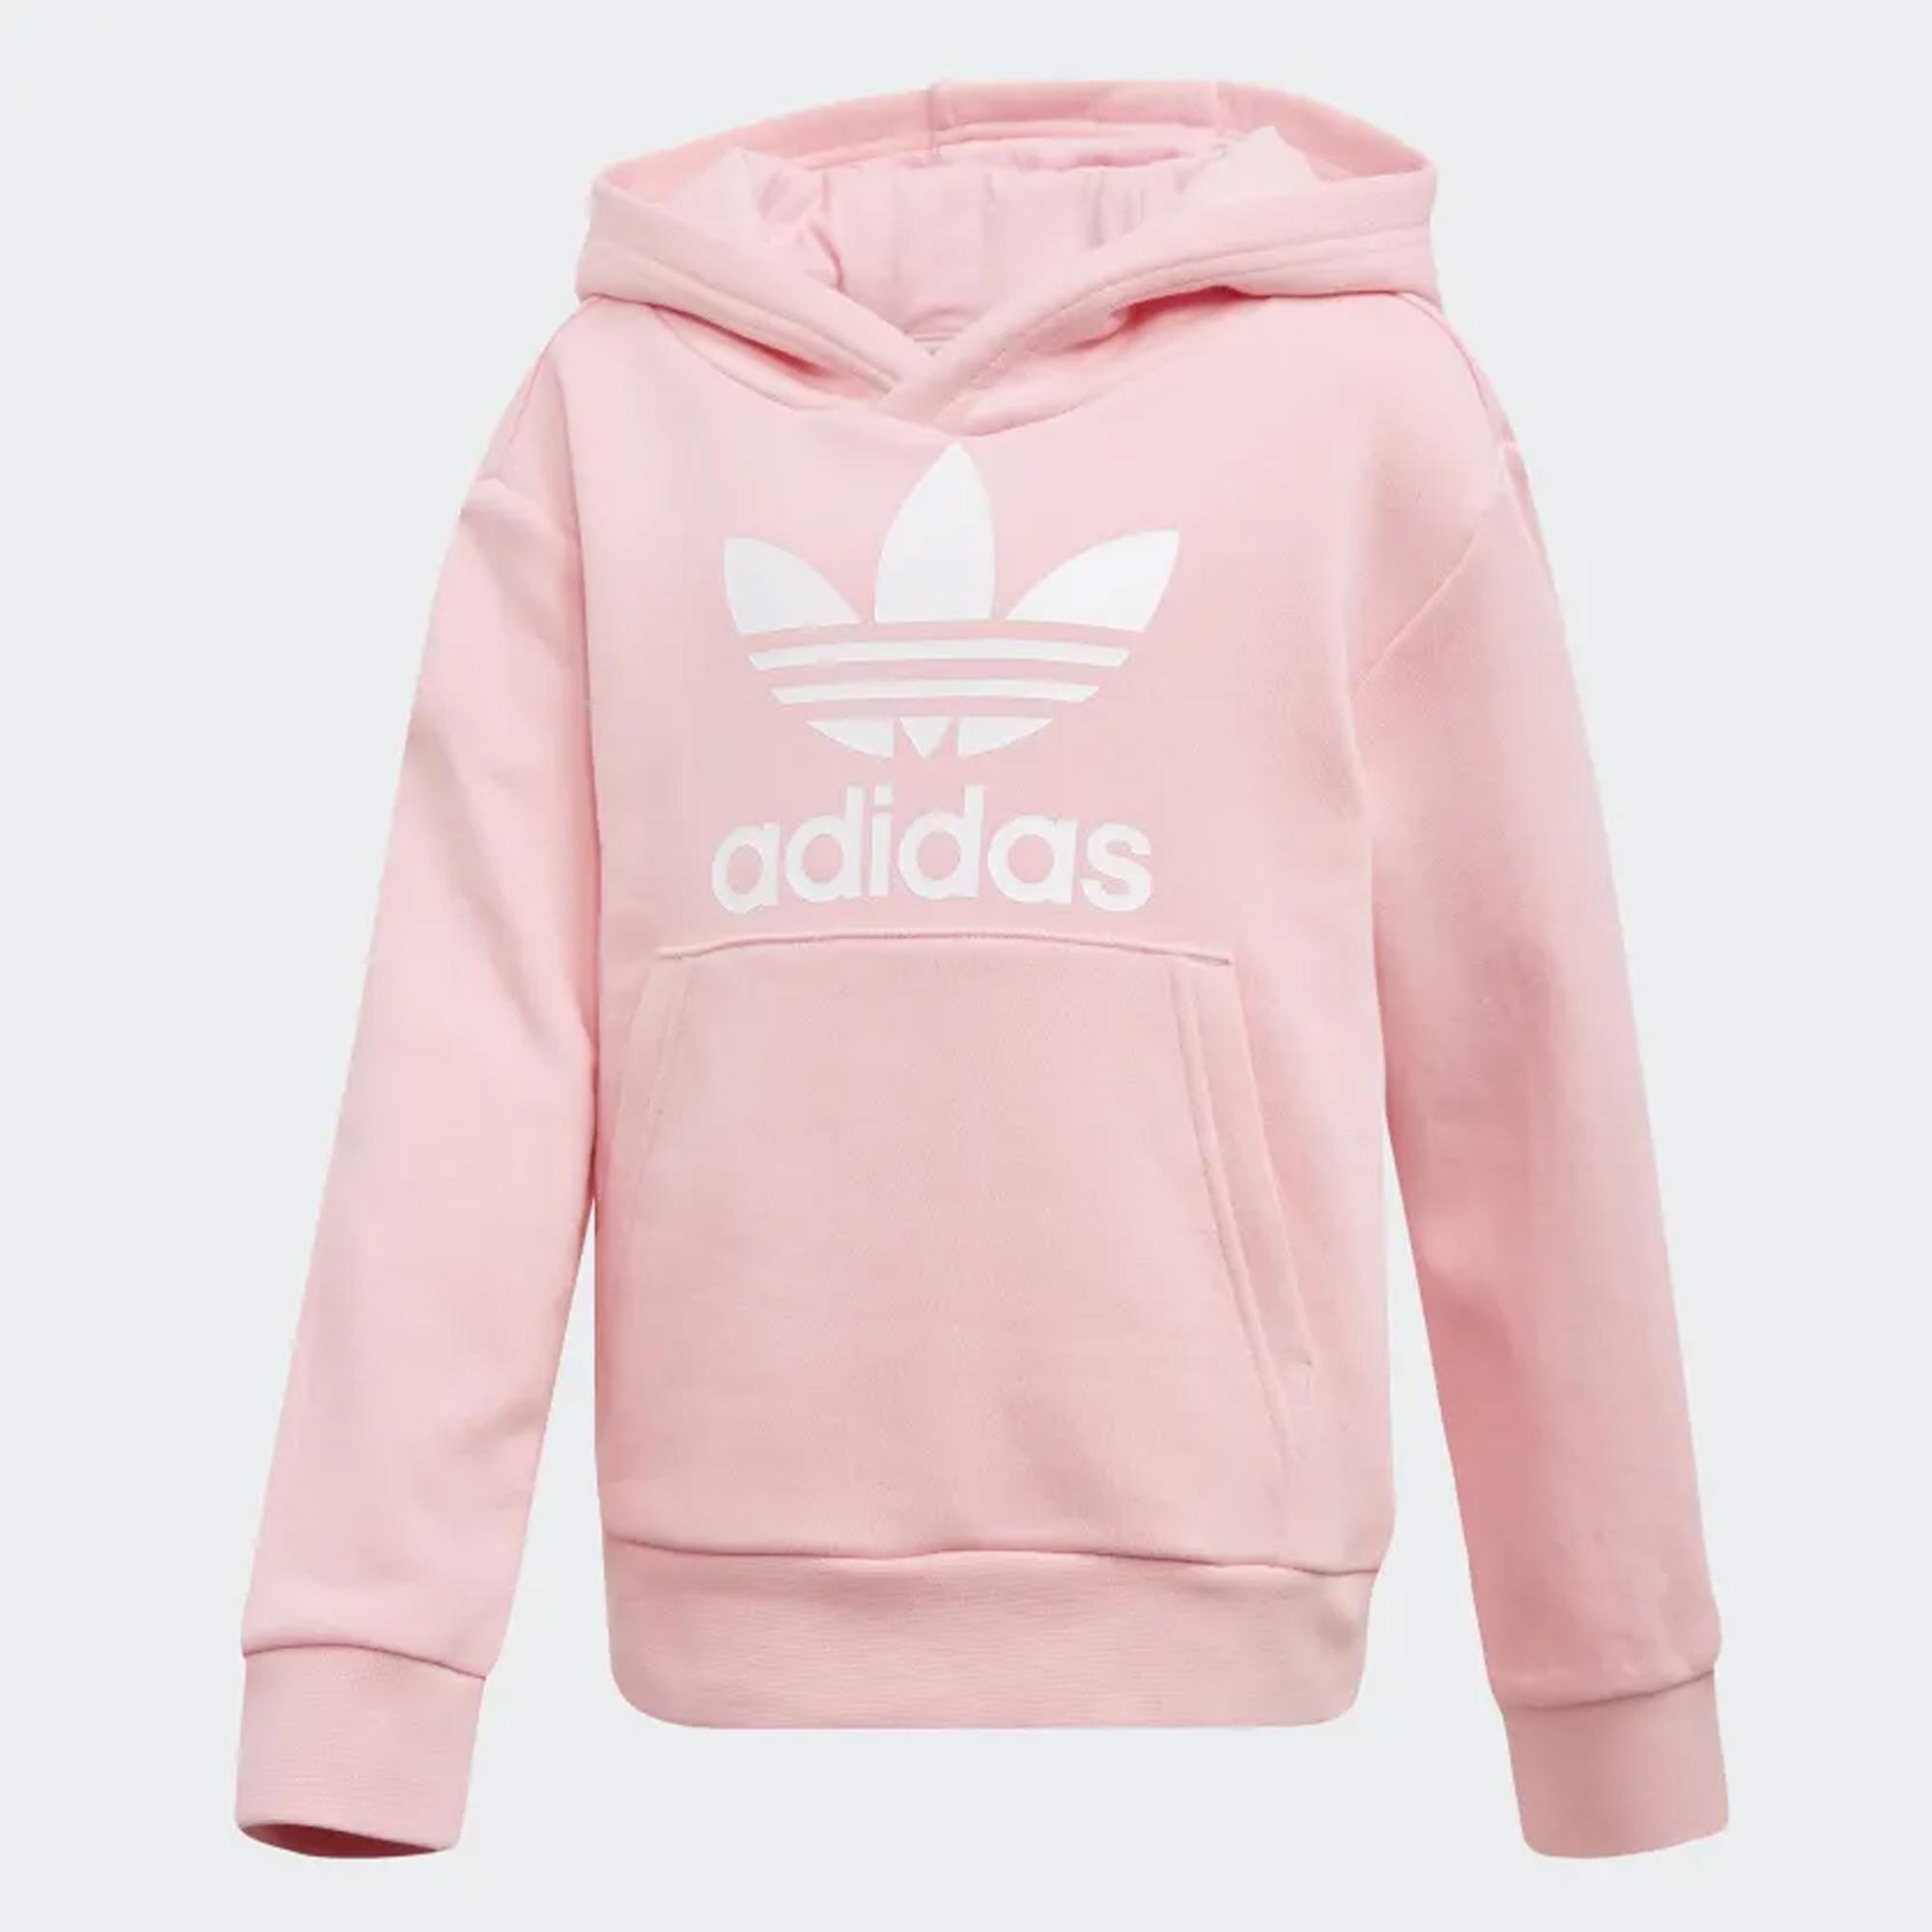 Trefoil Hoodie Set Light Pink & White